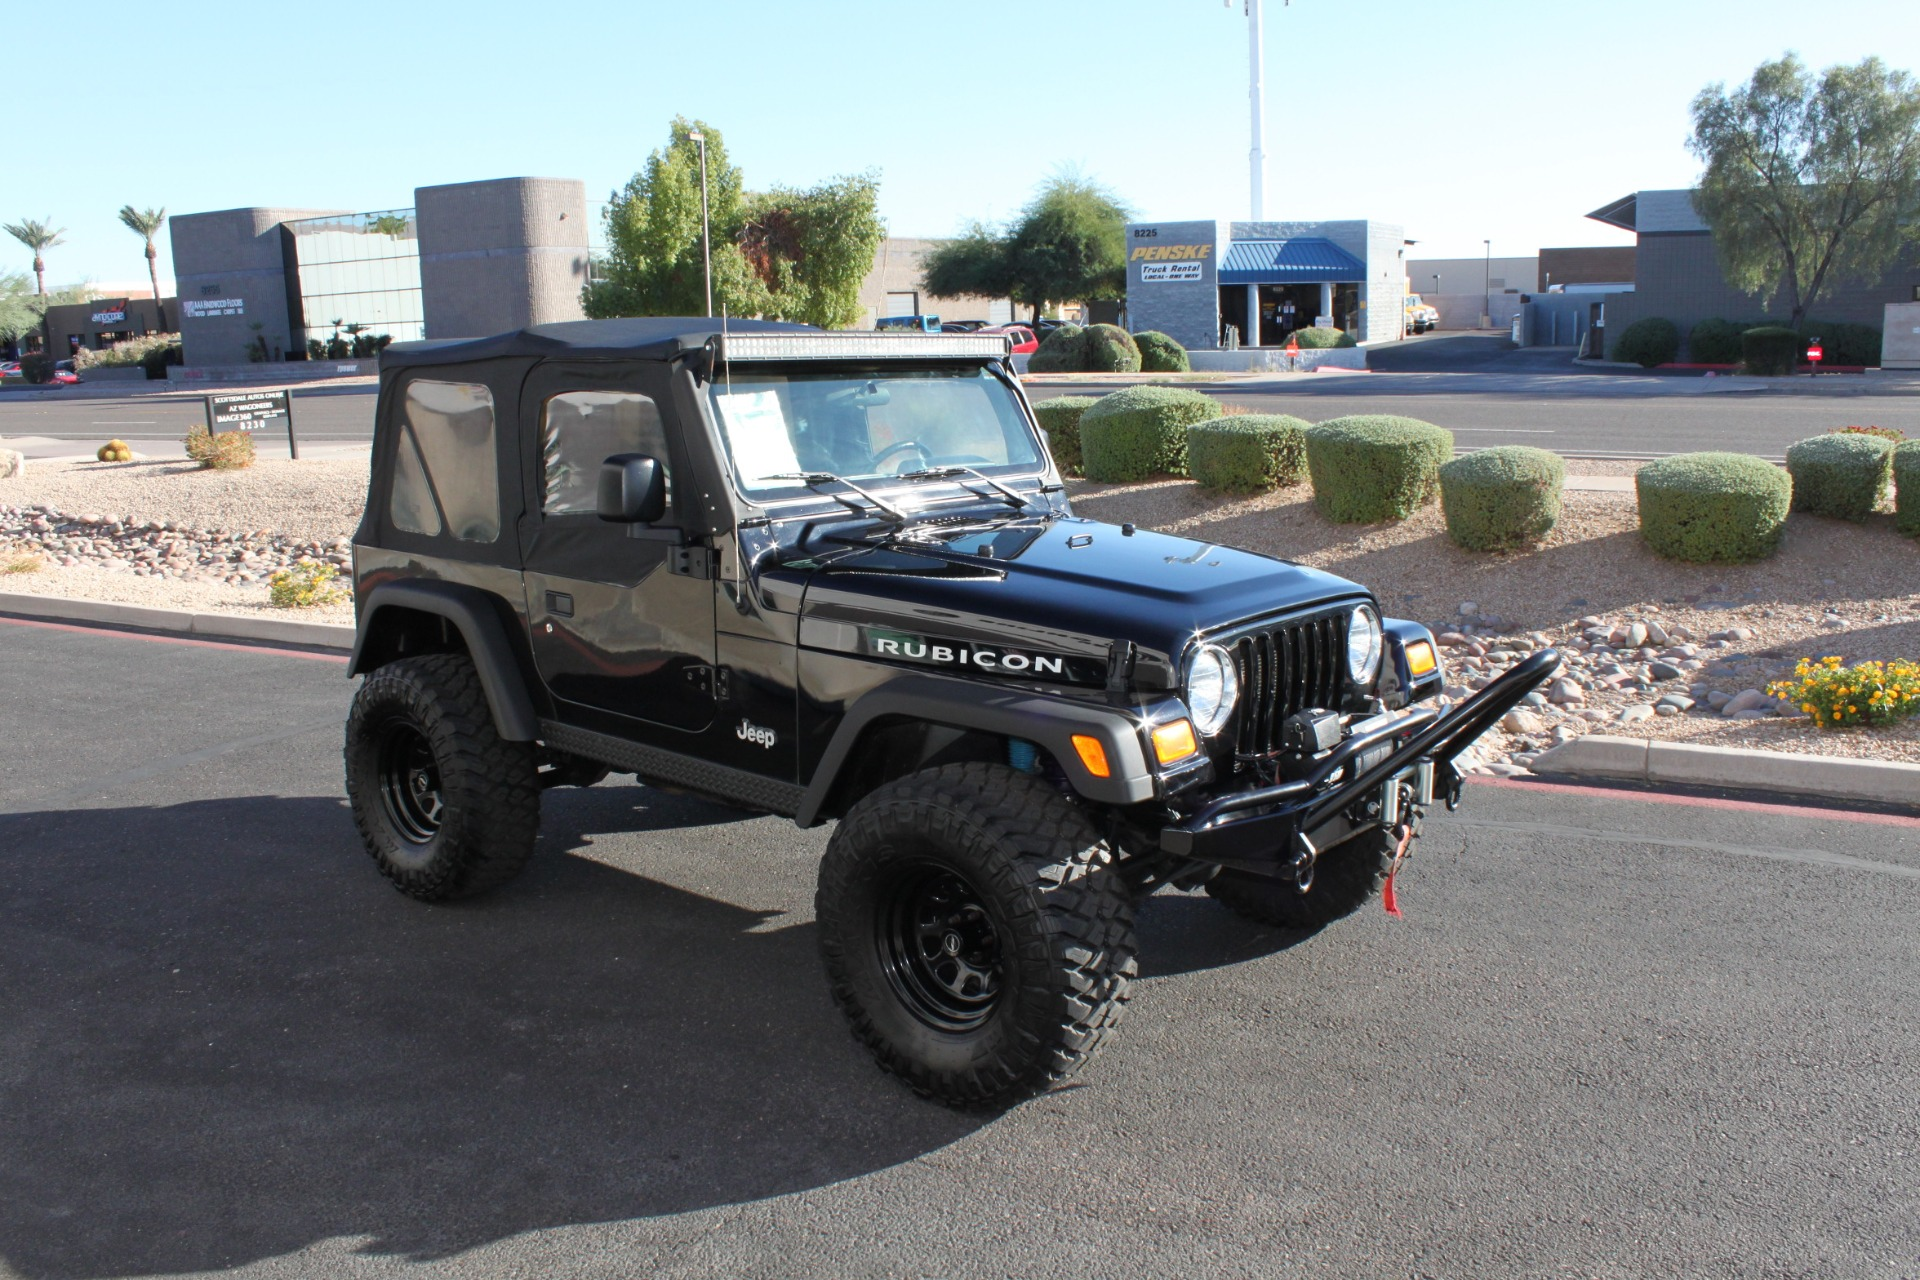 Used-2004-Jeep-Wrangler-Rubicon-Camaro